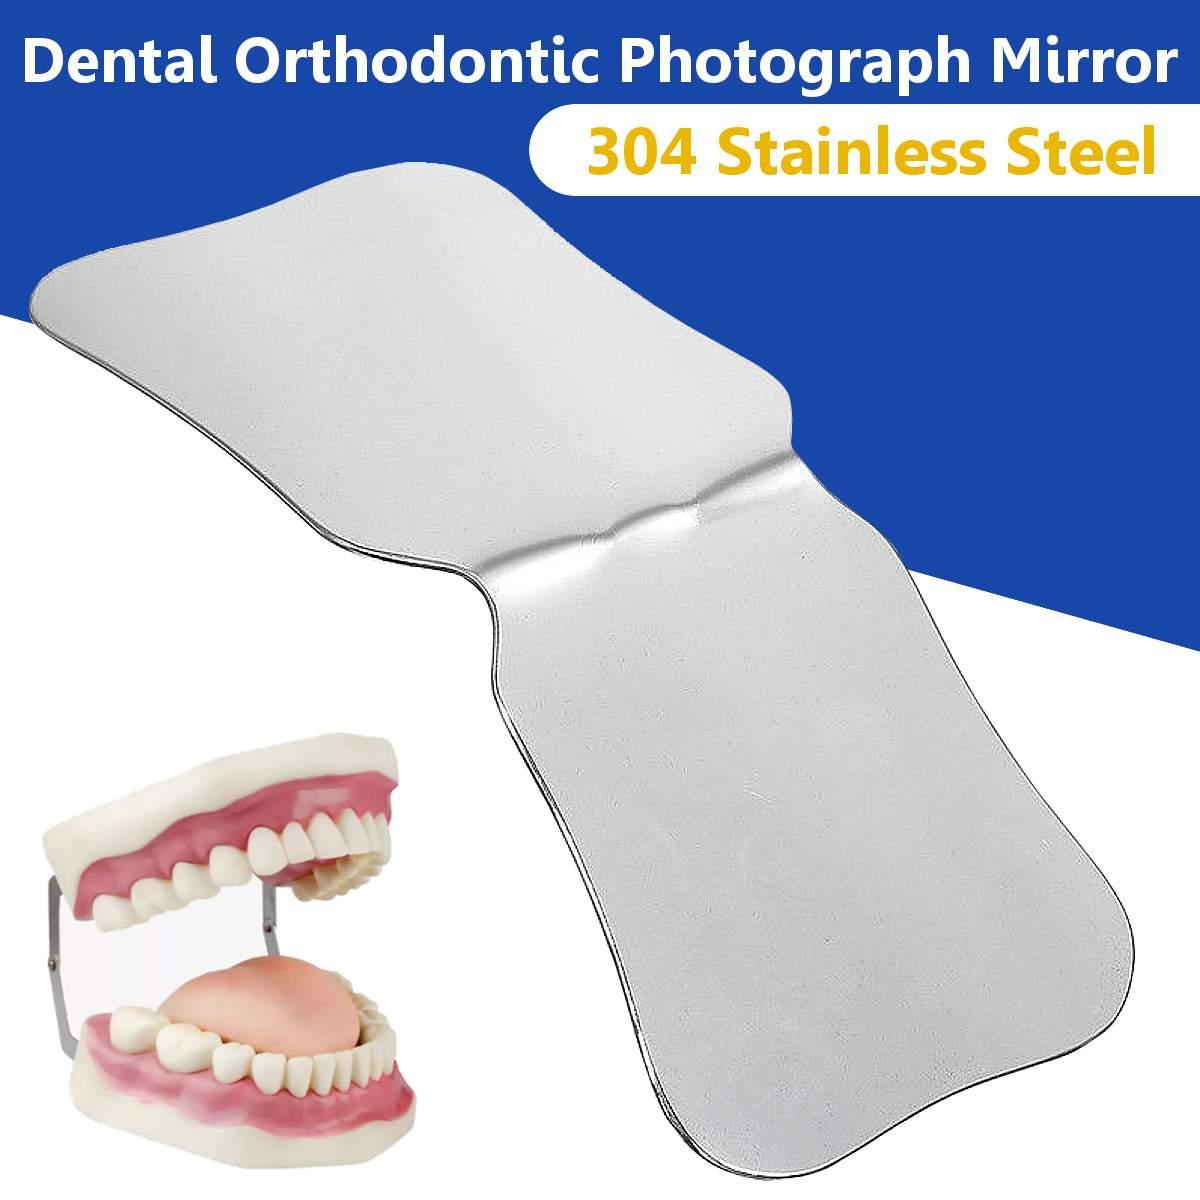 Stainless Steel Dental Photographic Reflector Mirror Oral Teeth Orthodontic Mirror Dental Clinic Dentist Teeth Whitening Tool